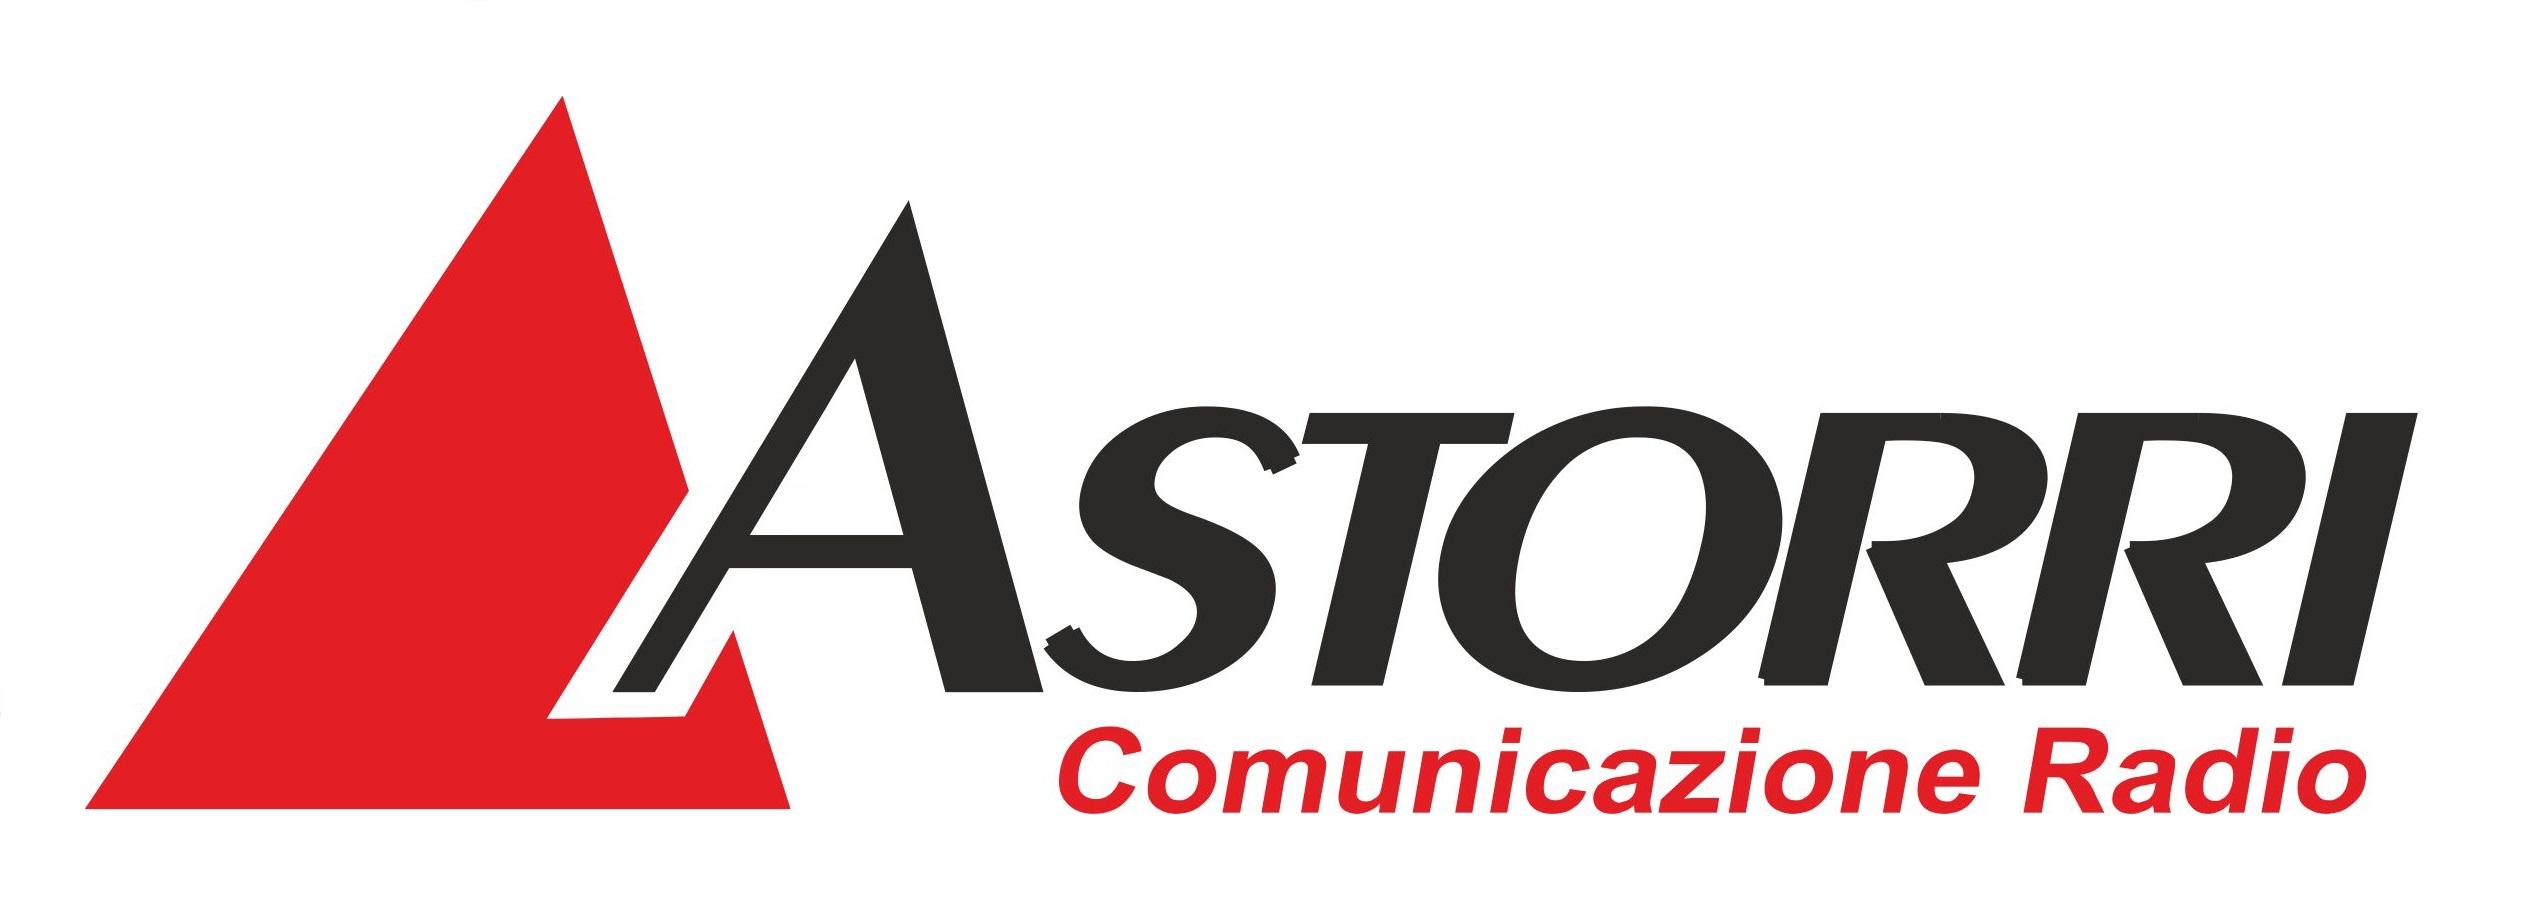 ASTORRI * Il Punto sulla Radio